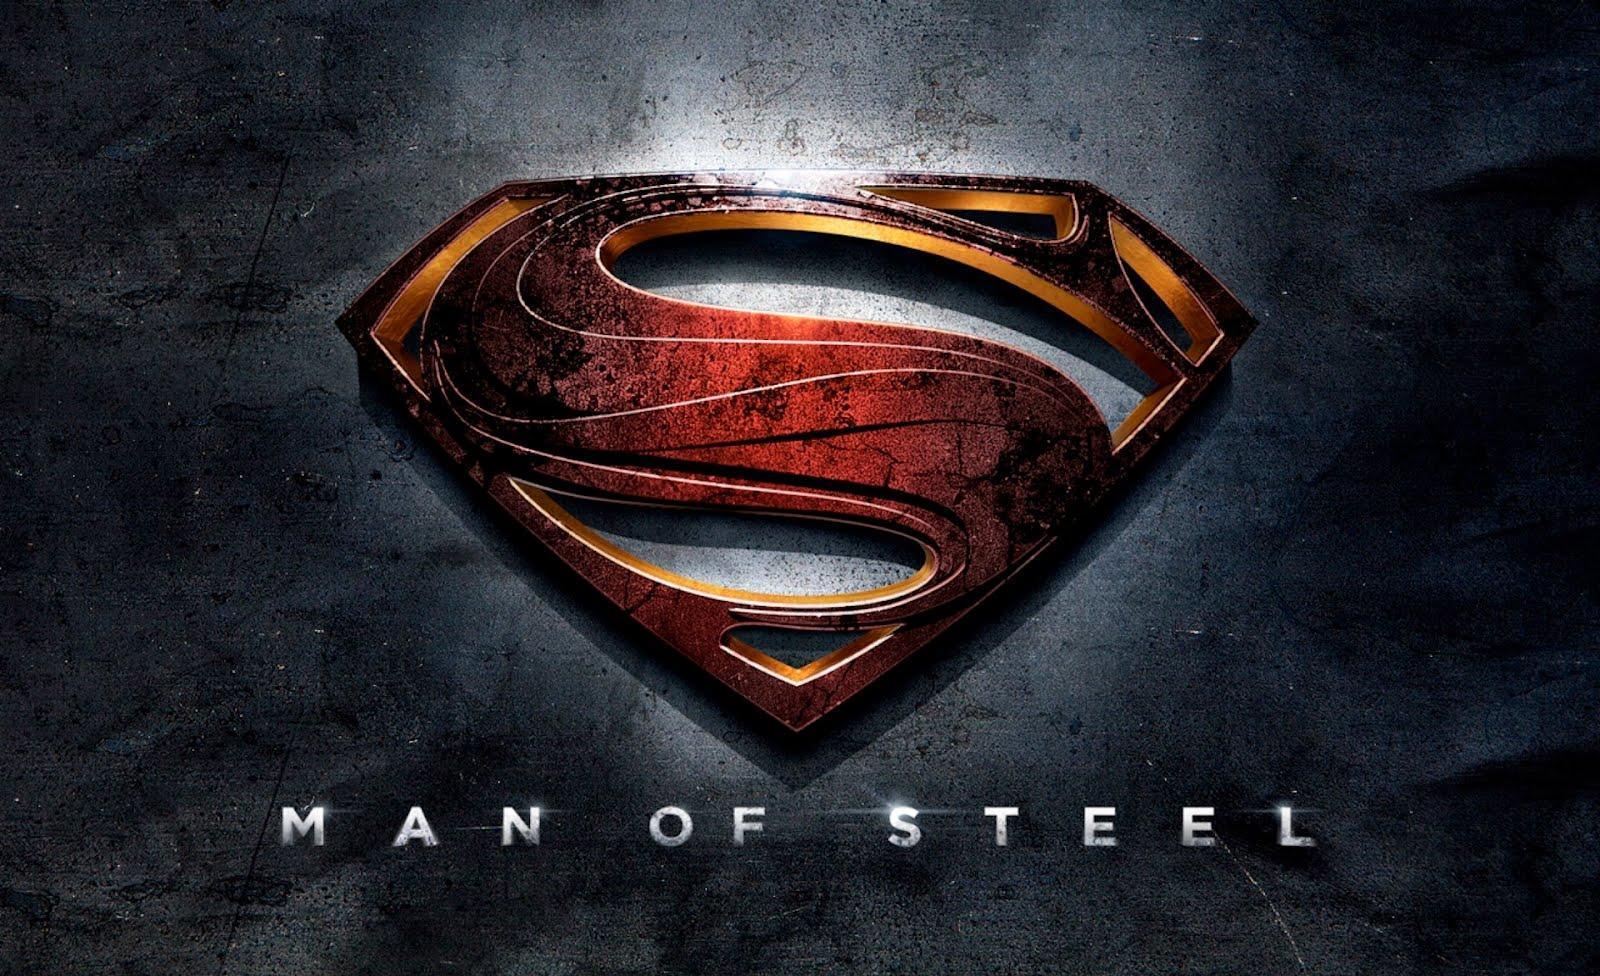 New Superman Logo Wallpapers - Wallpaper Cave